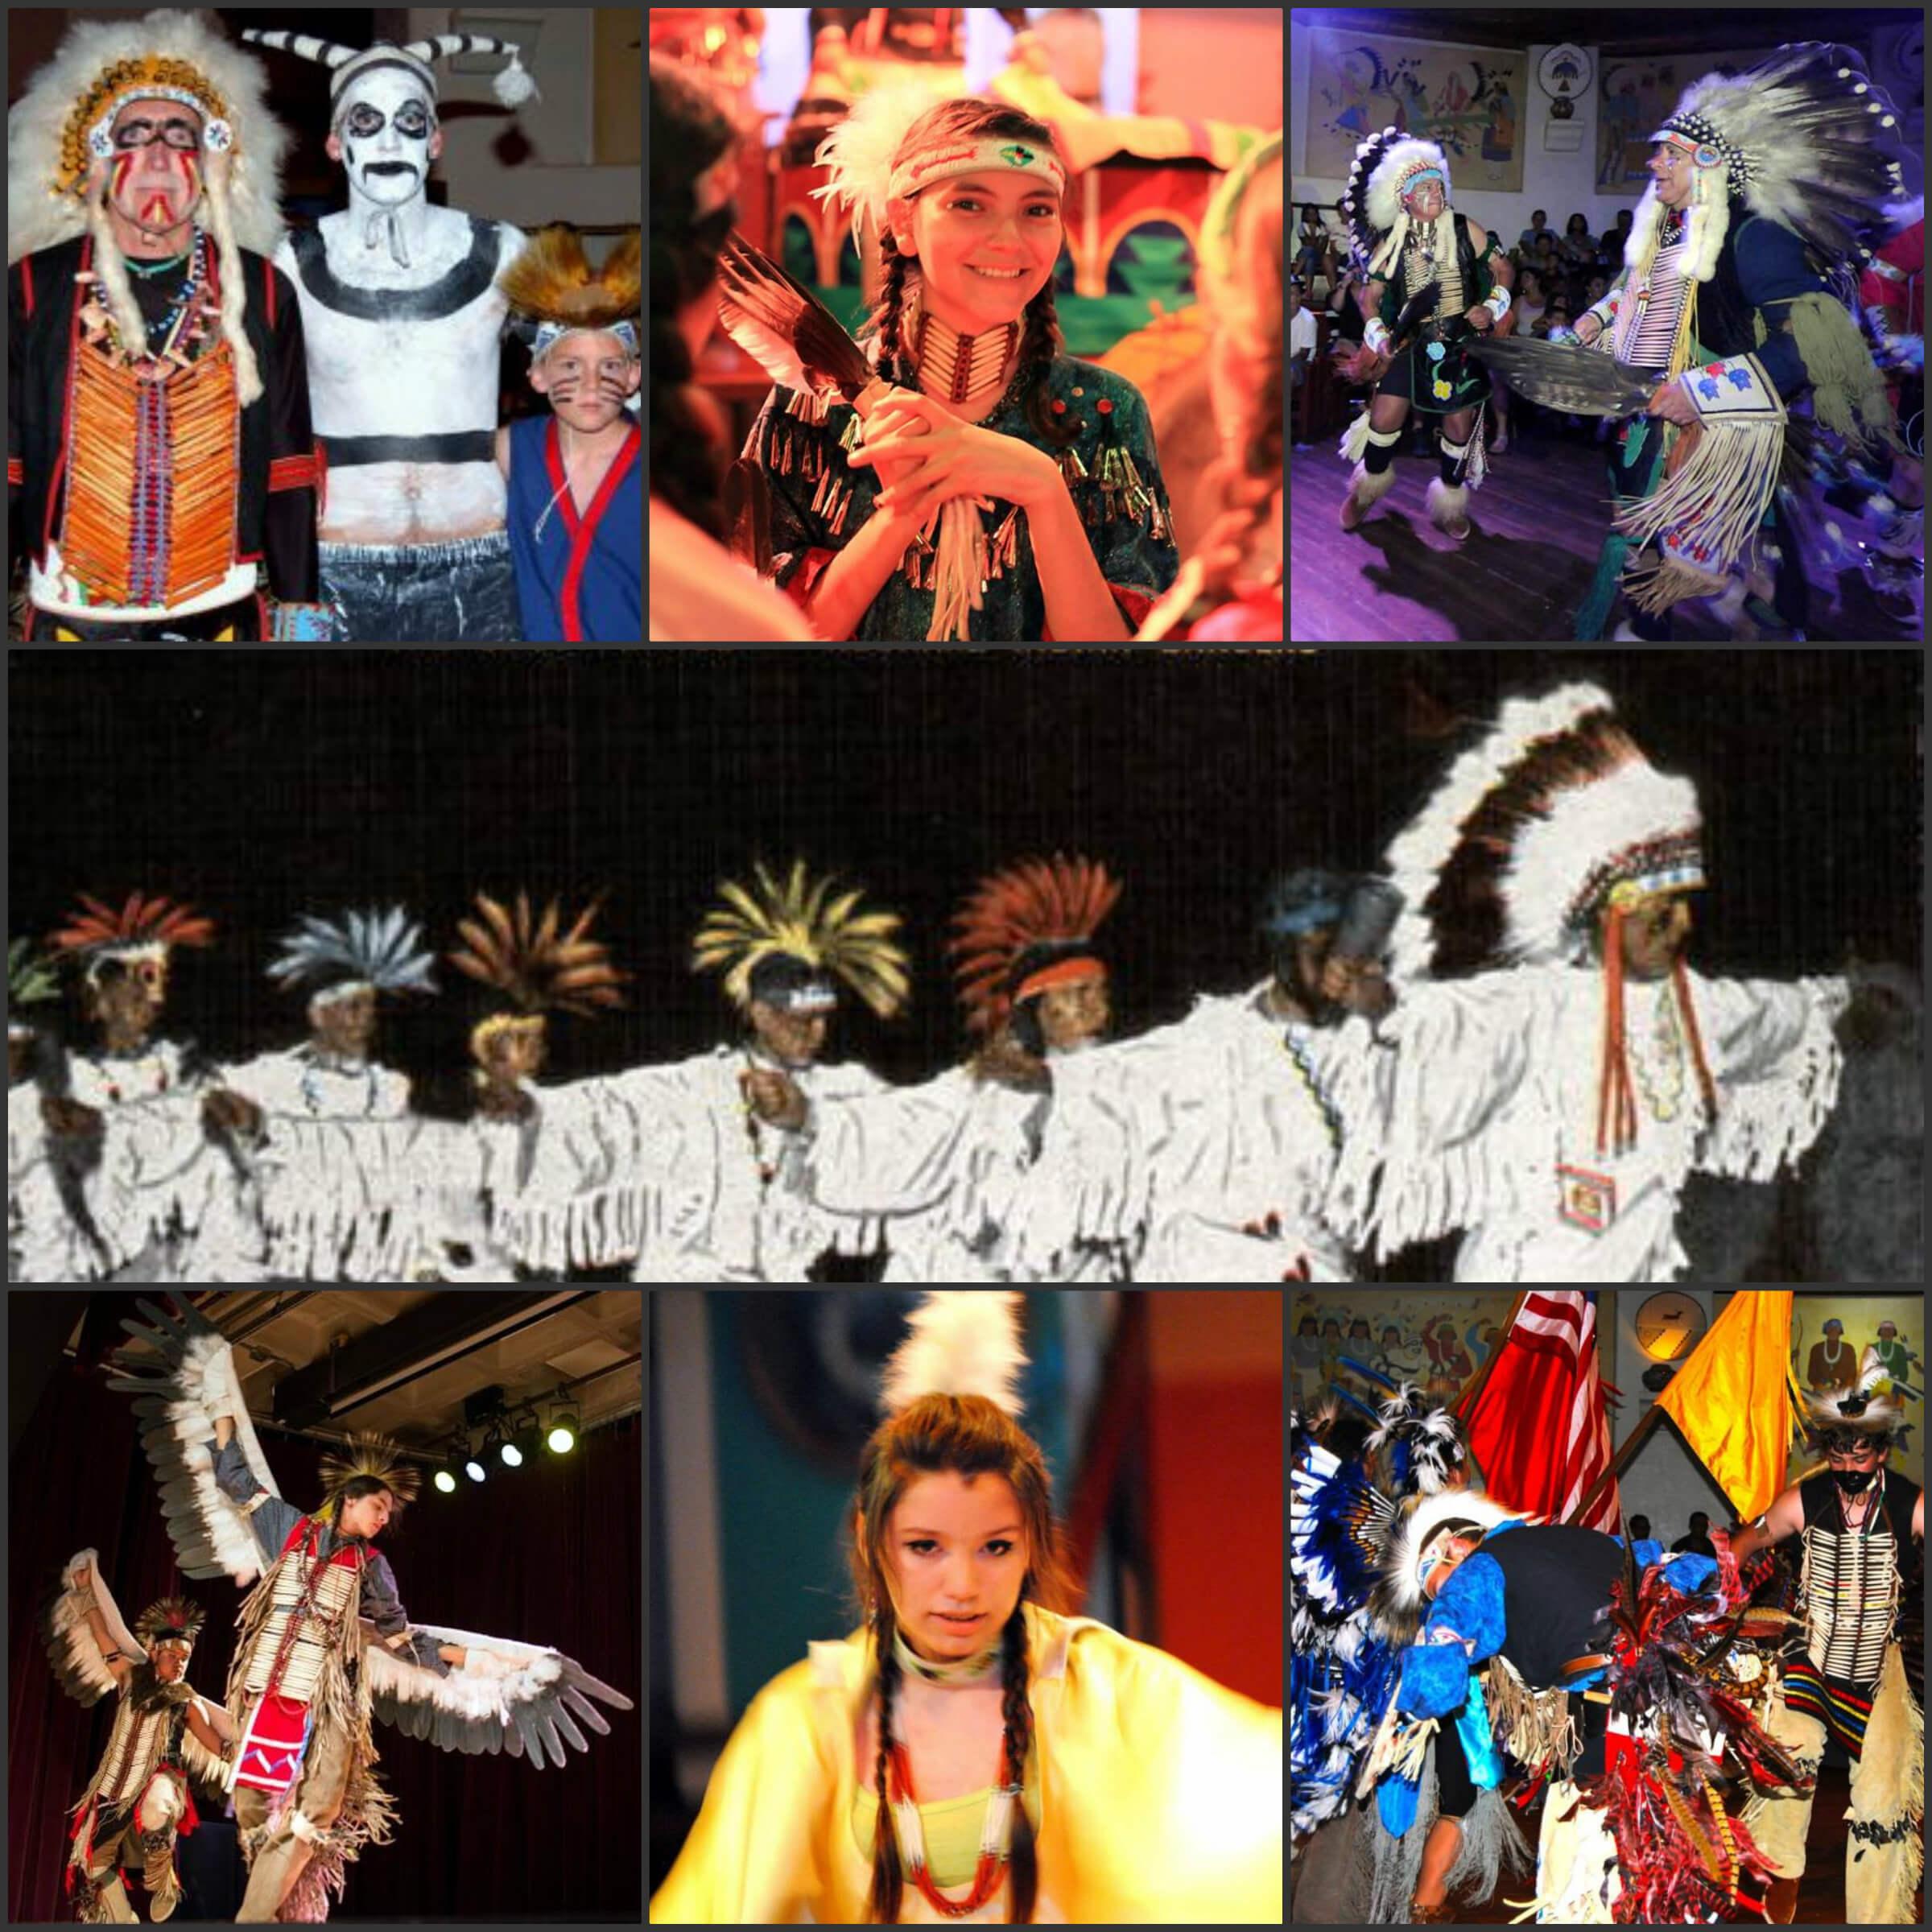 Koshare Indian Dancers